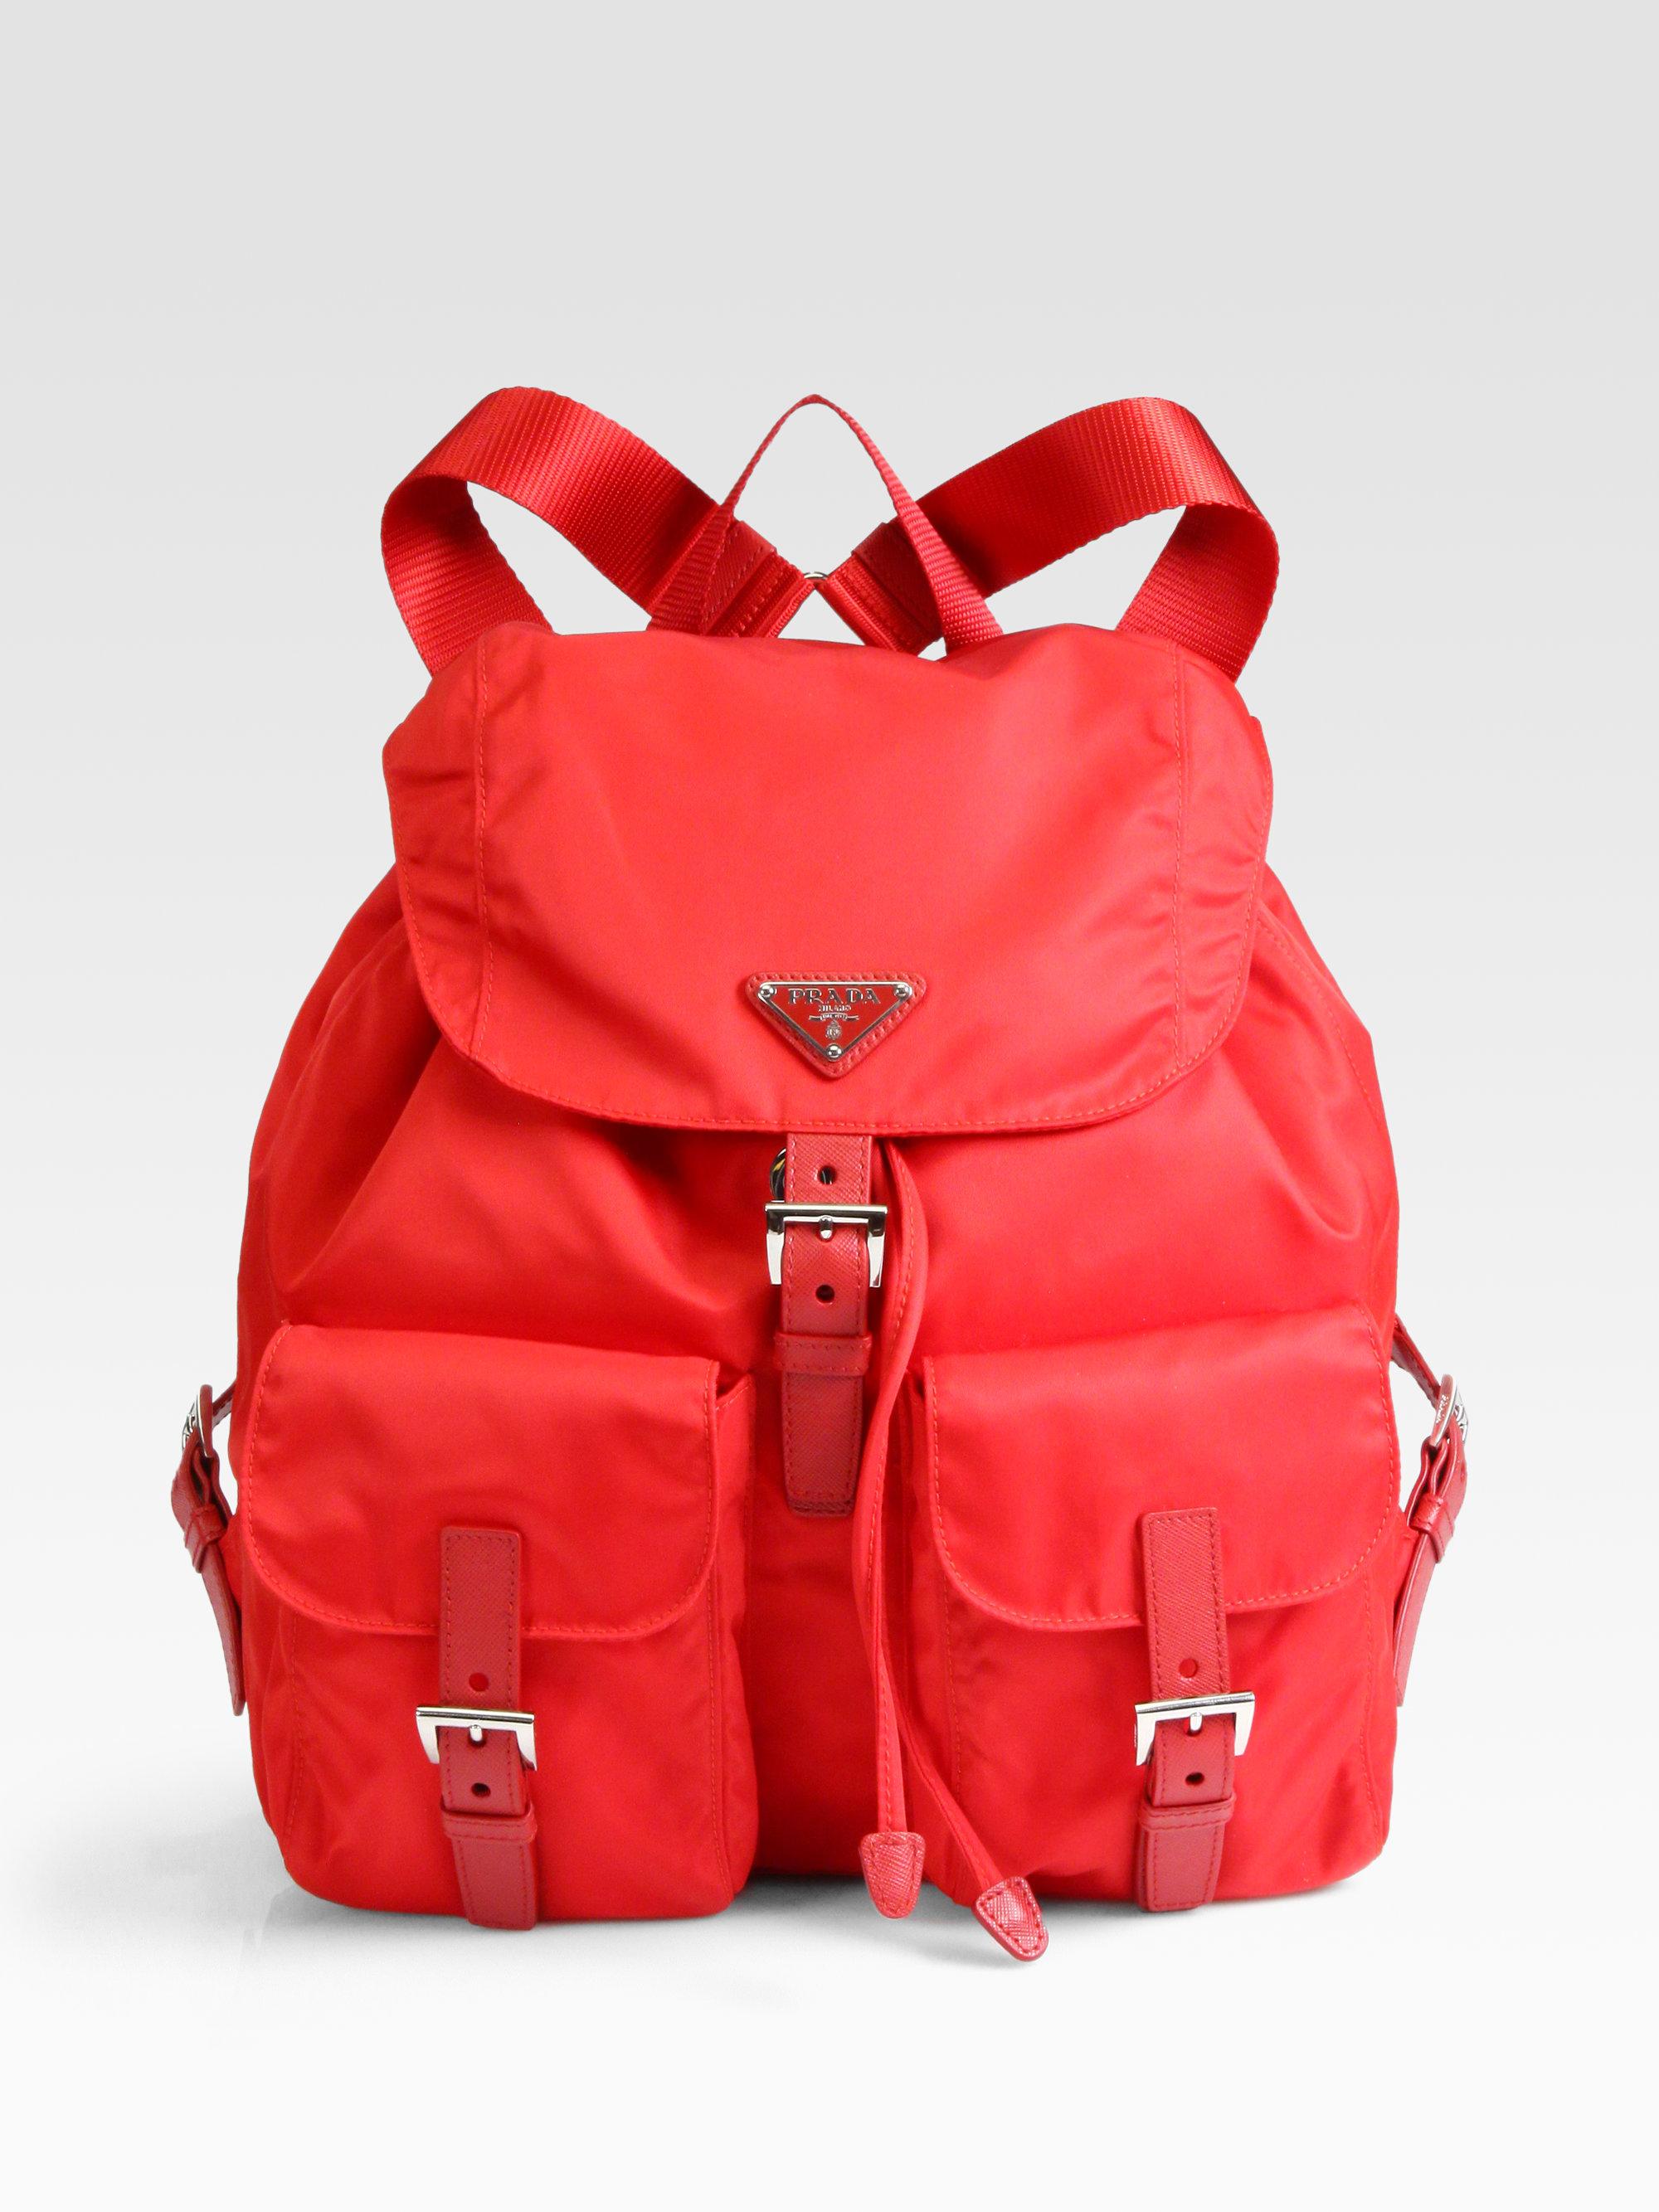 445a5be4bcf35 Lyst - Prada Vela Backpack in Red